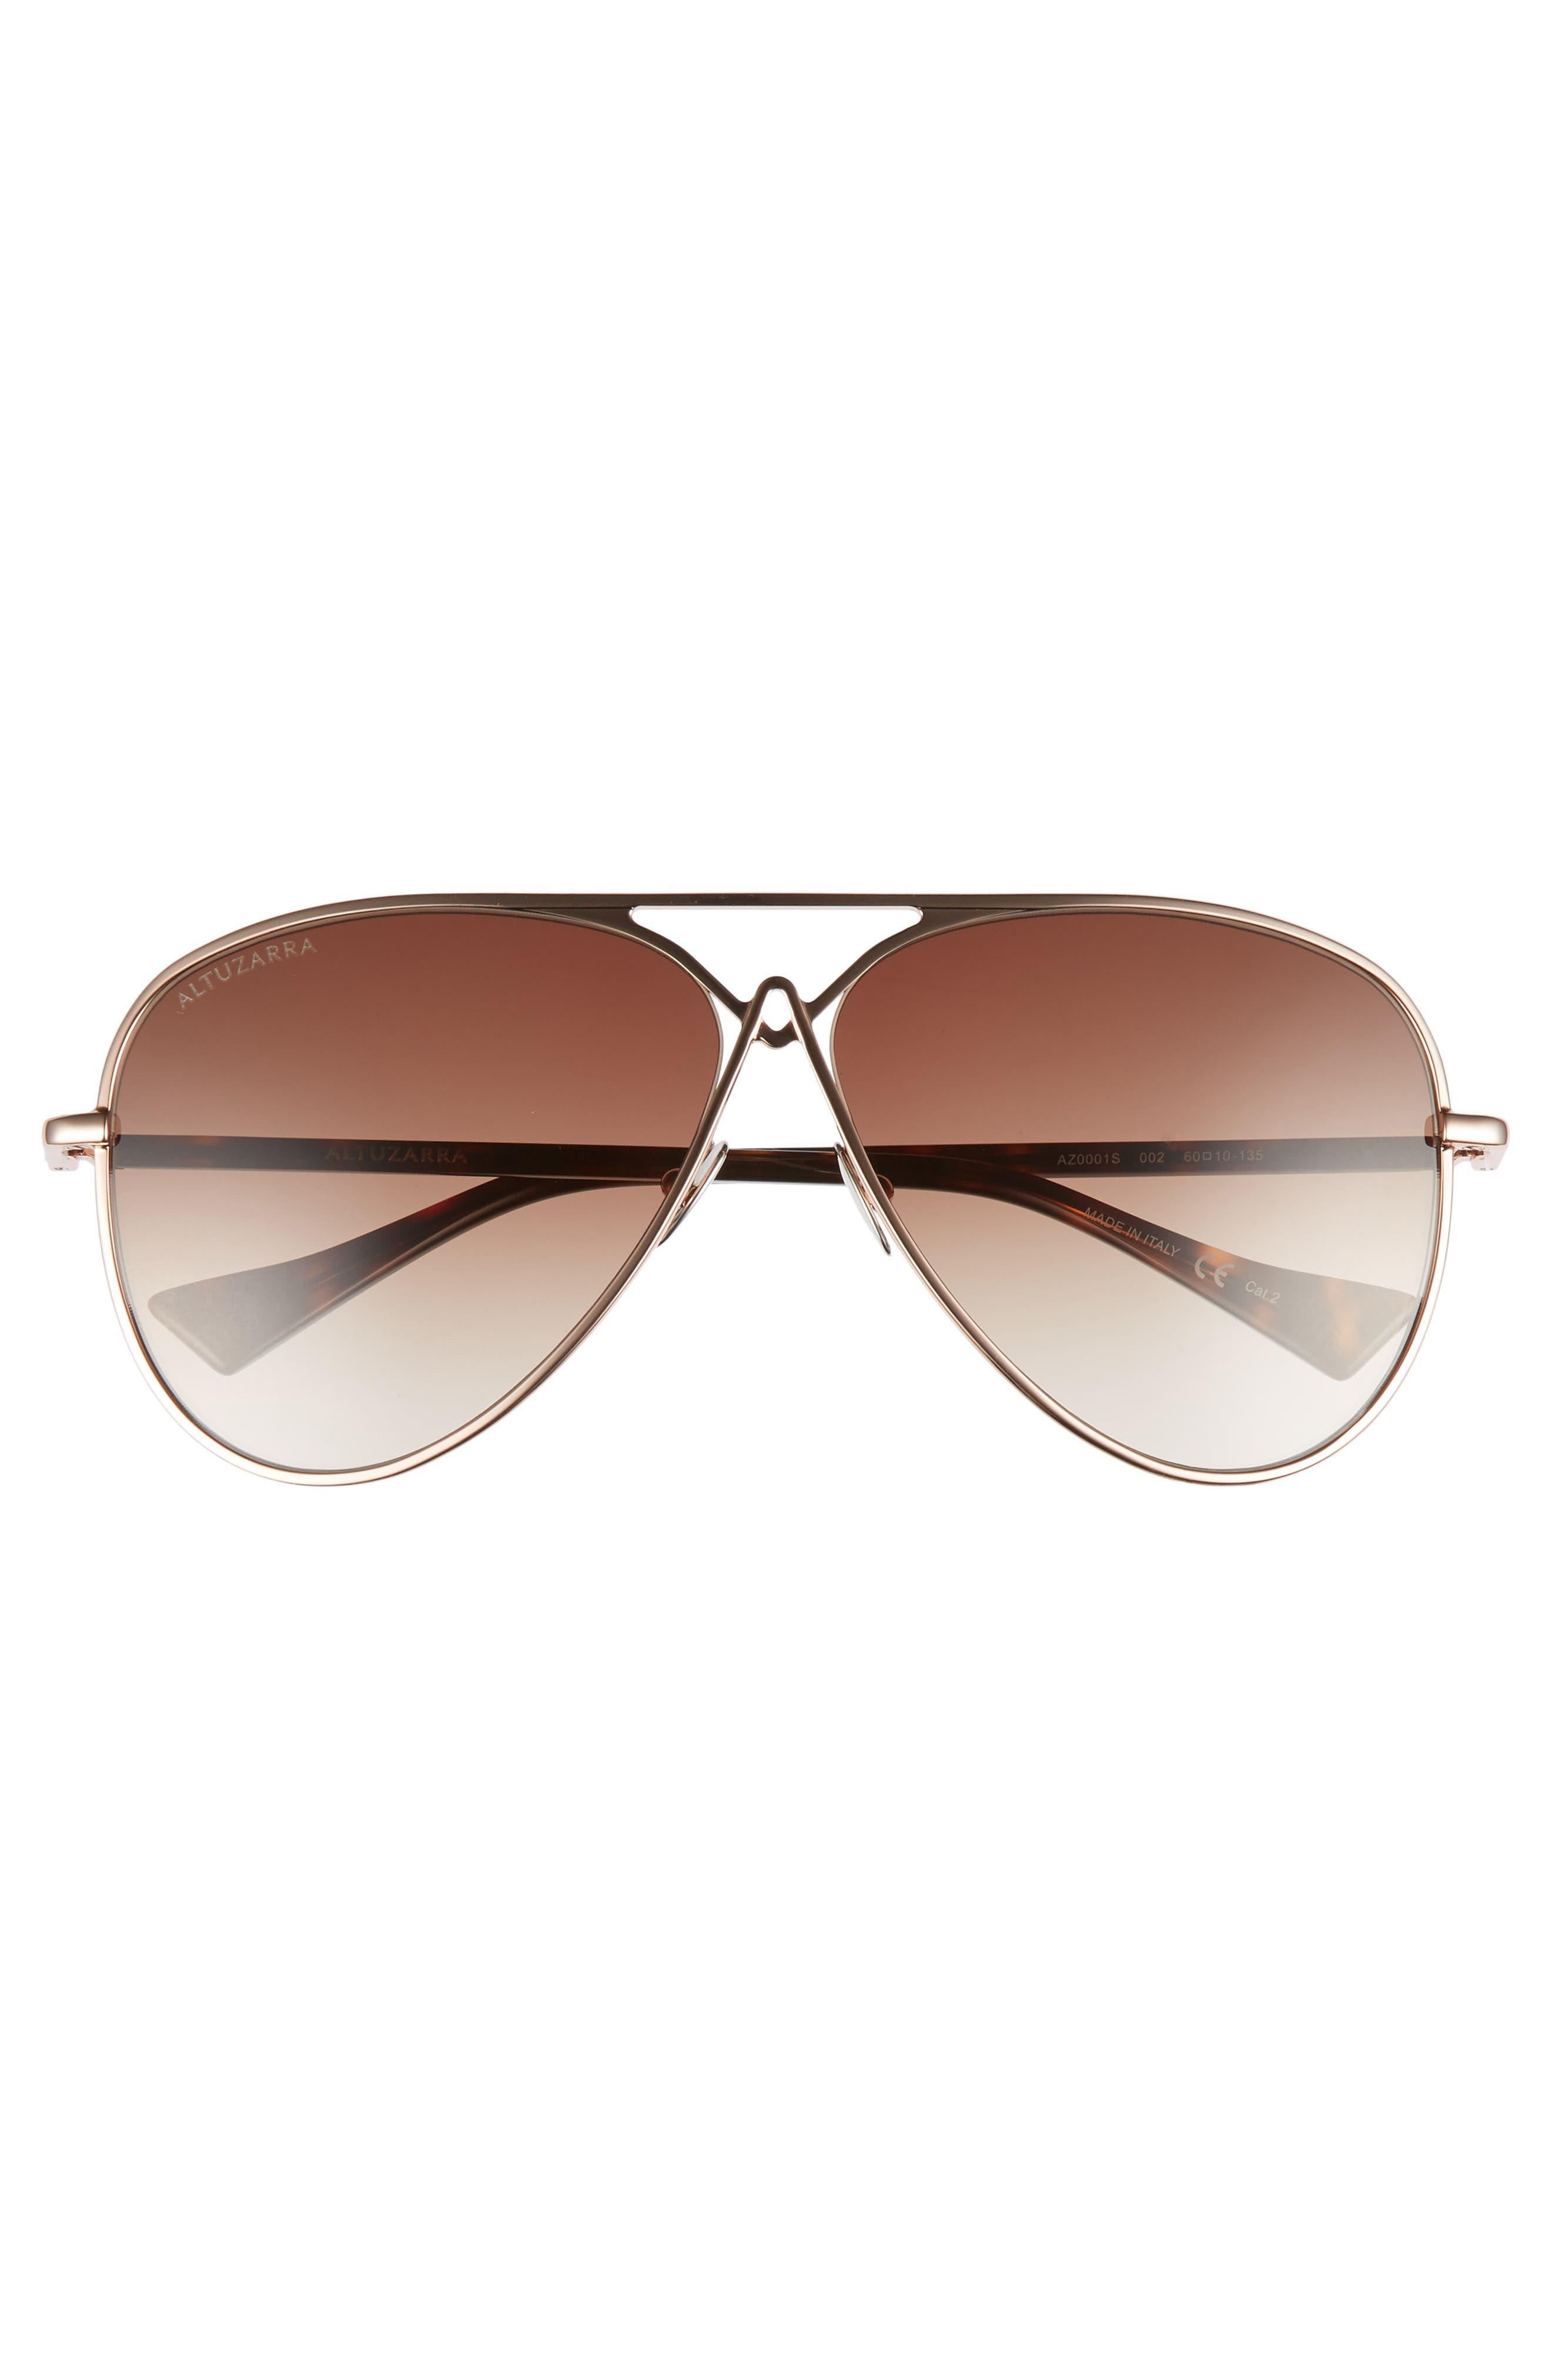 60mm Metal Aviator Sunglasses,                             Alternate thumbnail 3, color,                             ROSE GOLD